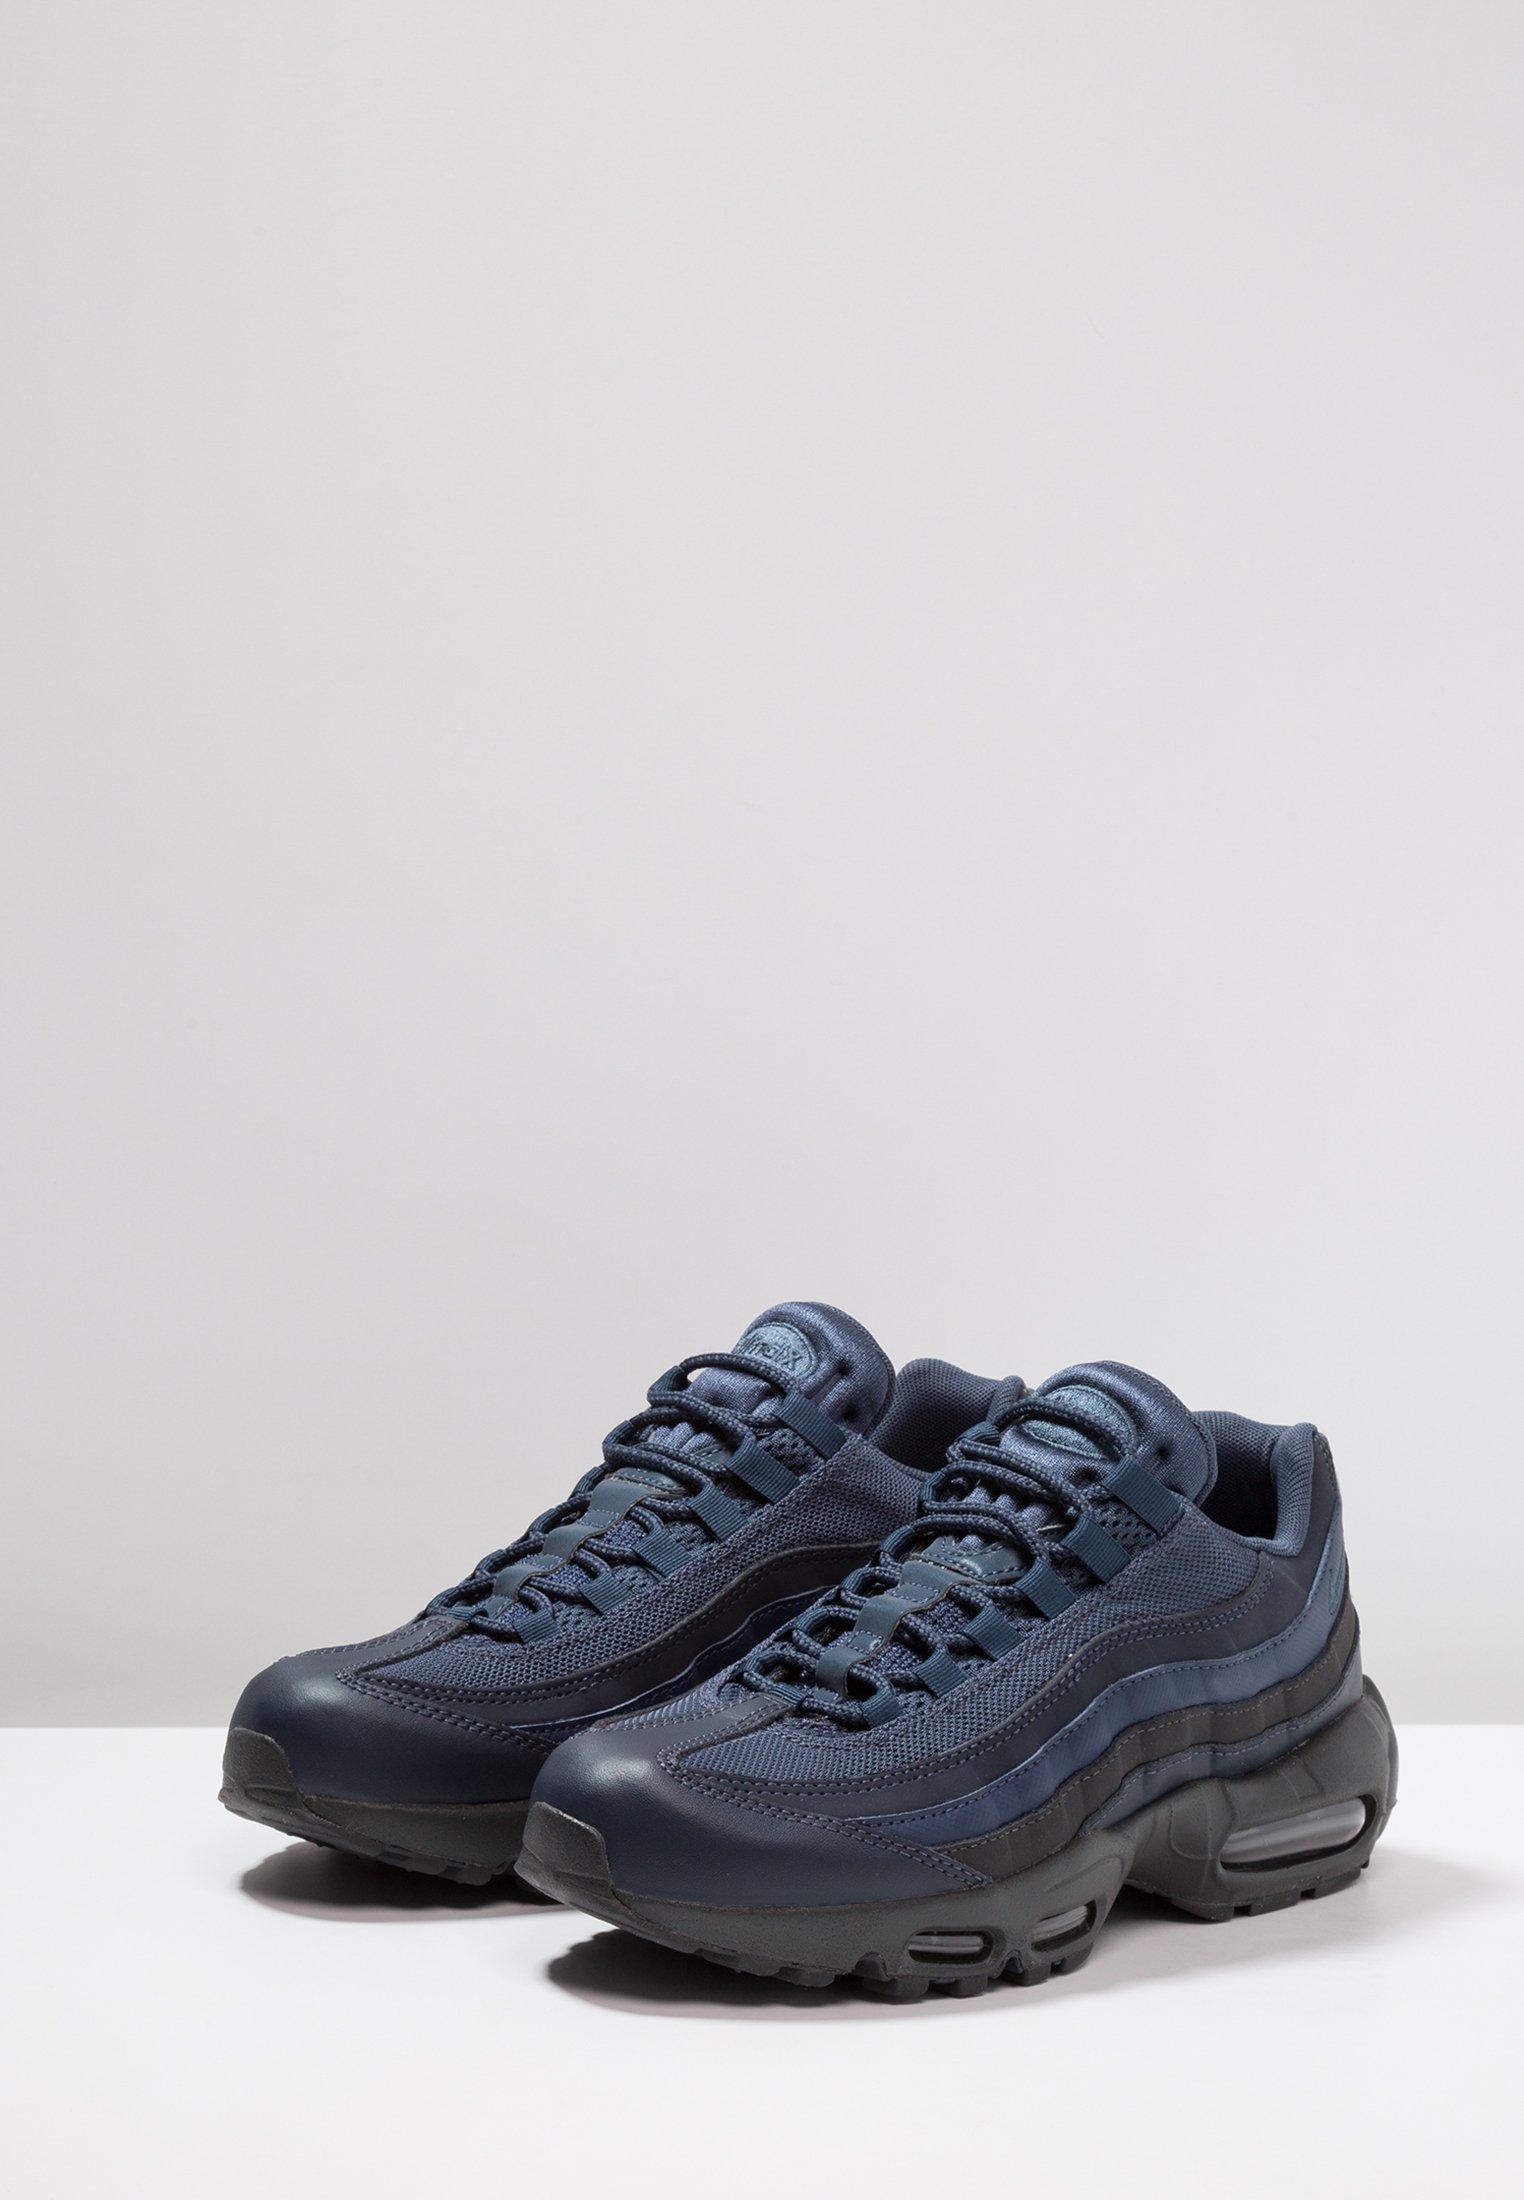 AIR MAX 95 ESSENTIAL Sneakers squadron blue